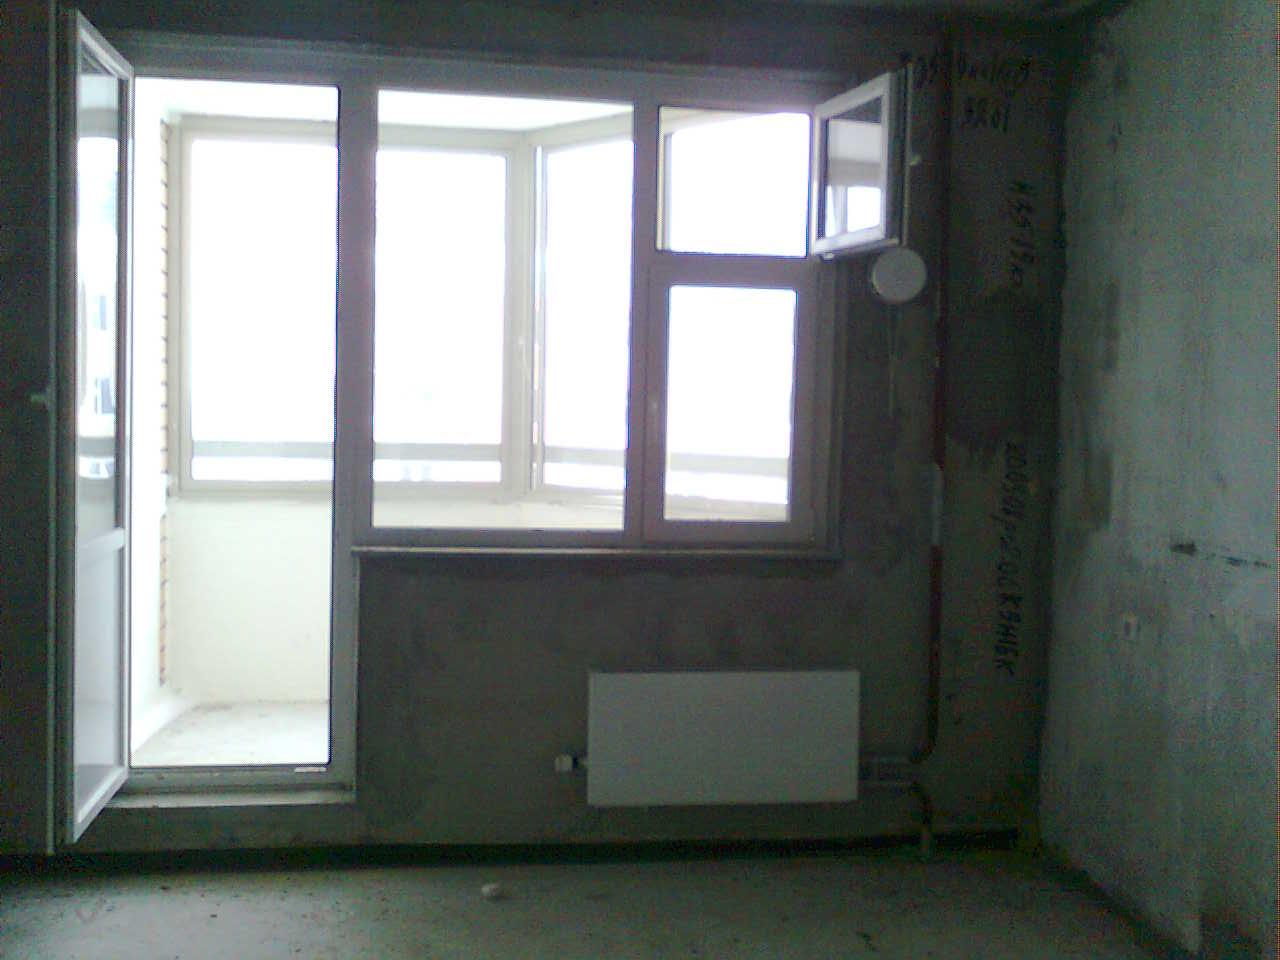 Шкаф на балконе в трешке п 44. - дизайнерские решения - ката.